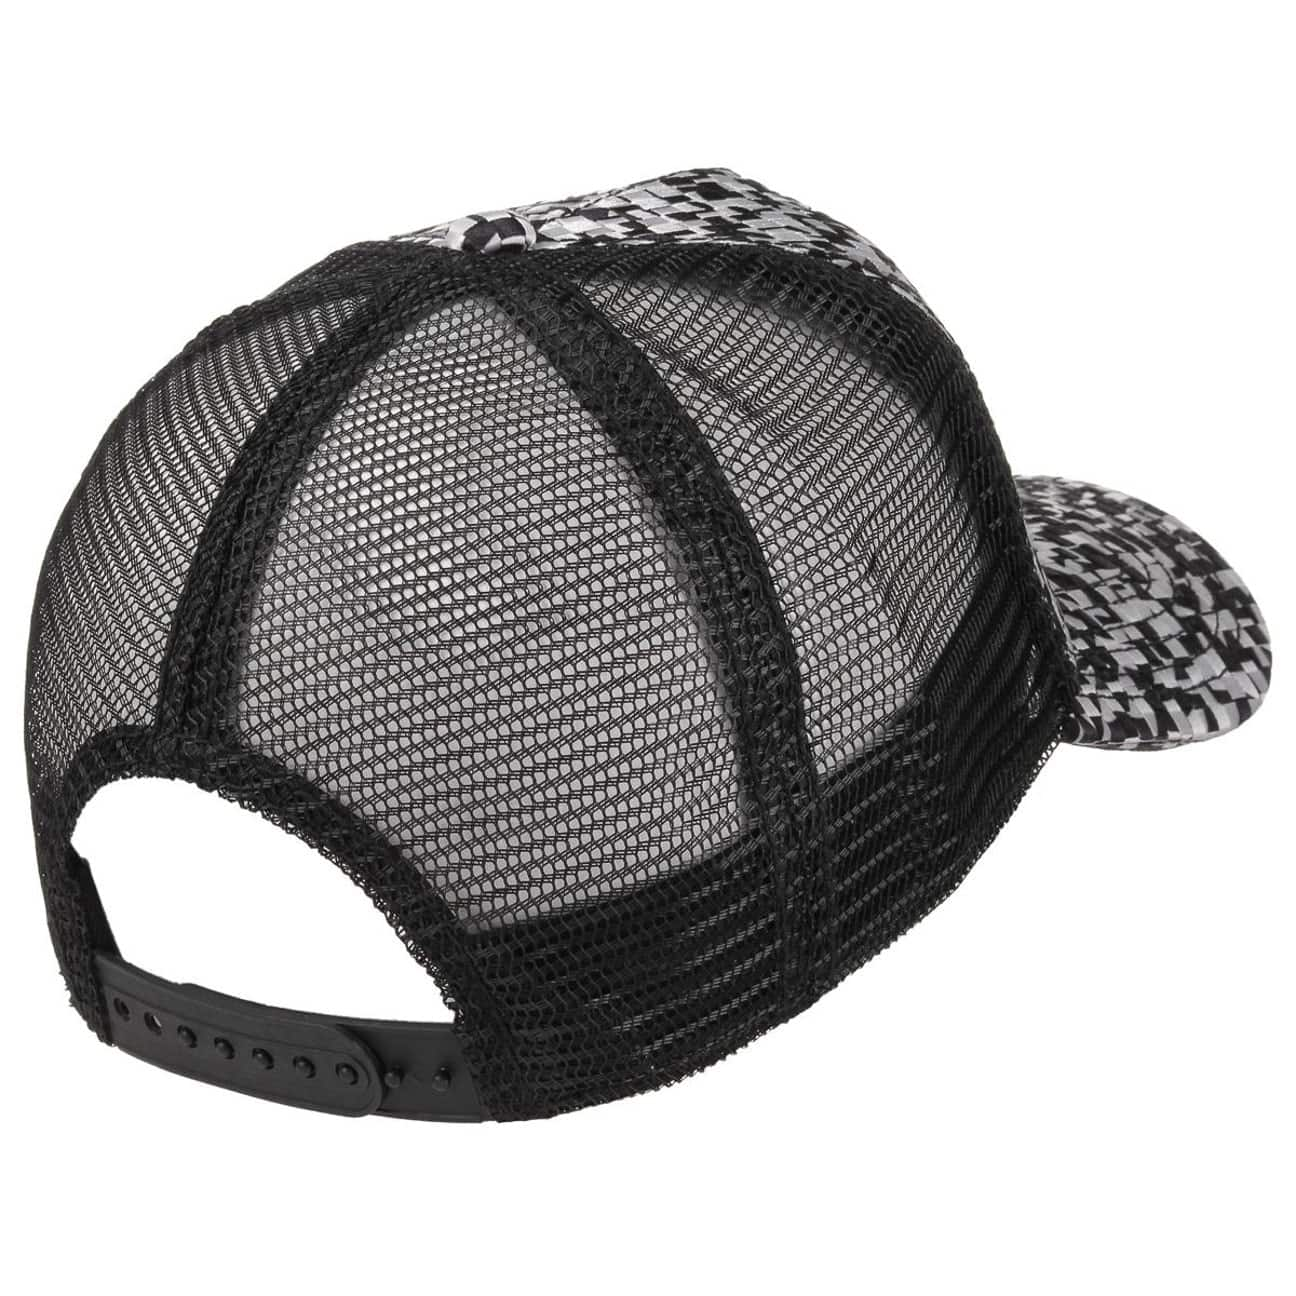 hft shifted trucker cap by djinns gbp 17 95 hats. Black Bedroom Furniture Sets. Home Design Ideas